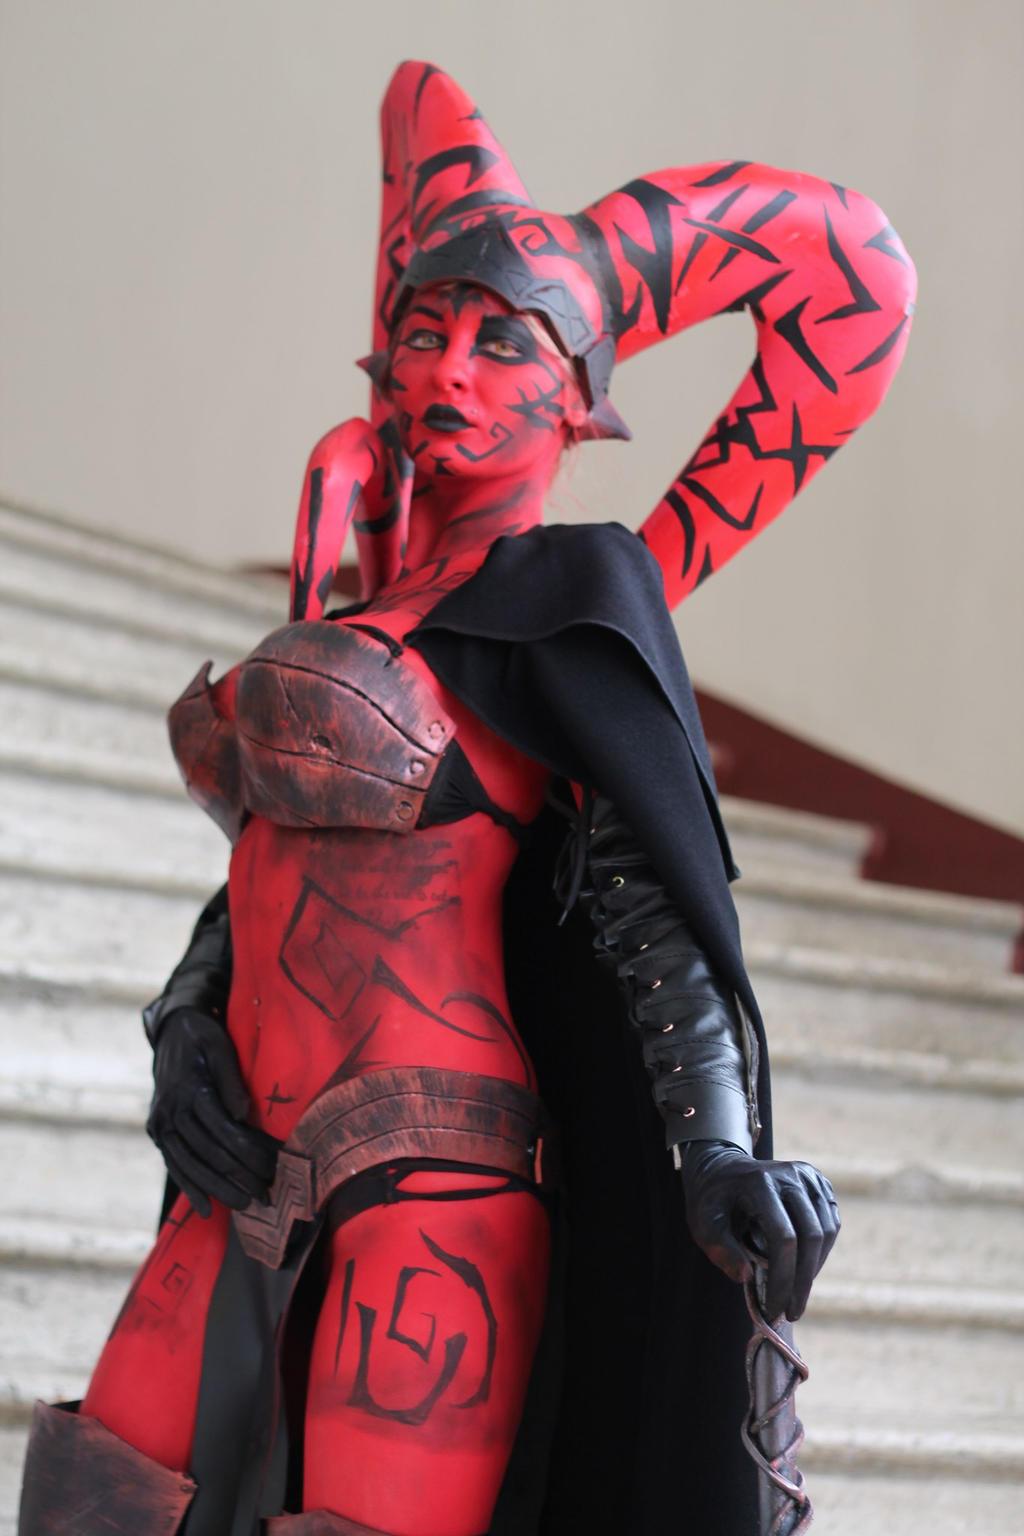 Sexy Jedi3 by CJRogue on DeviantArt